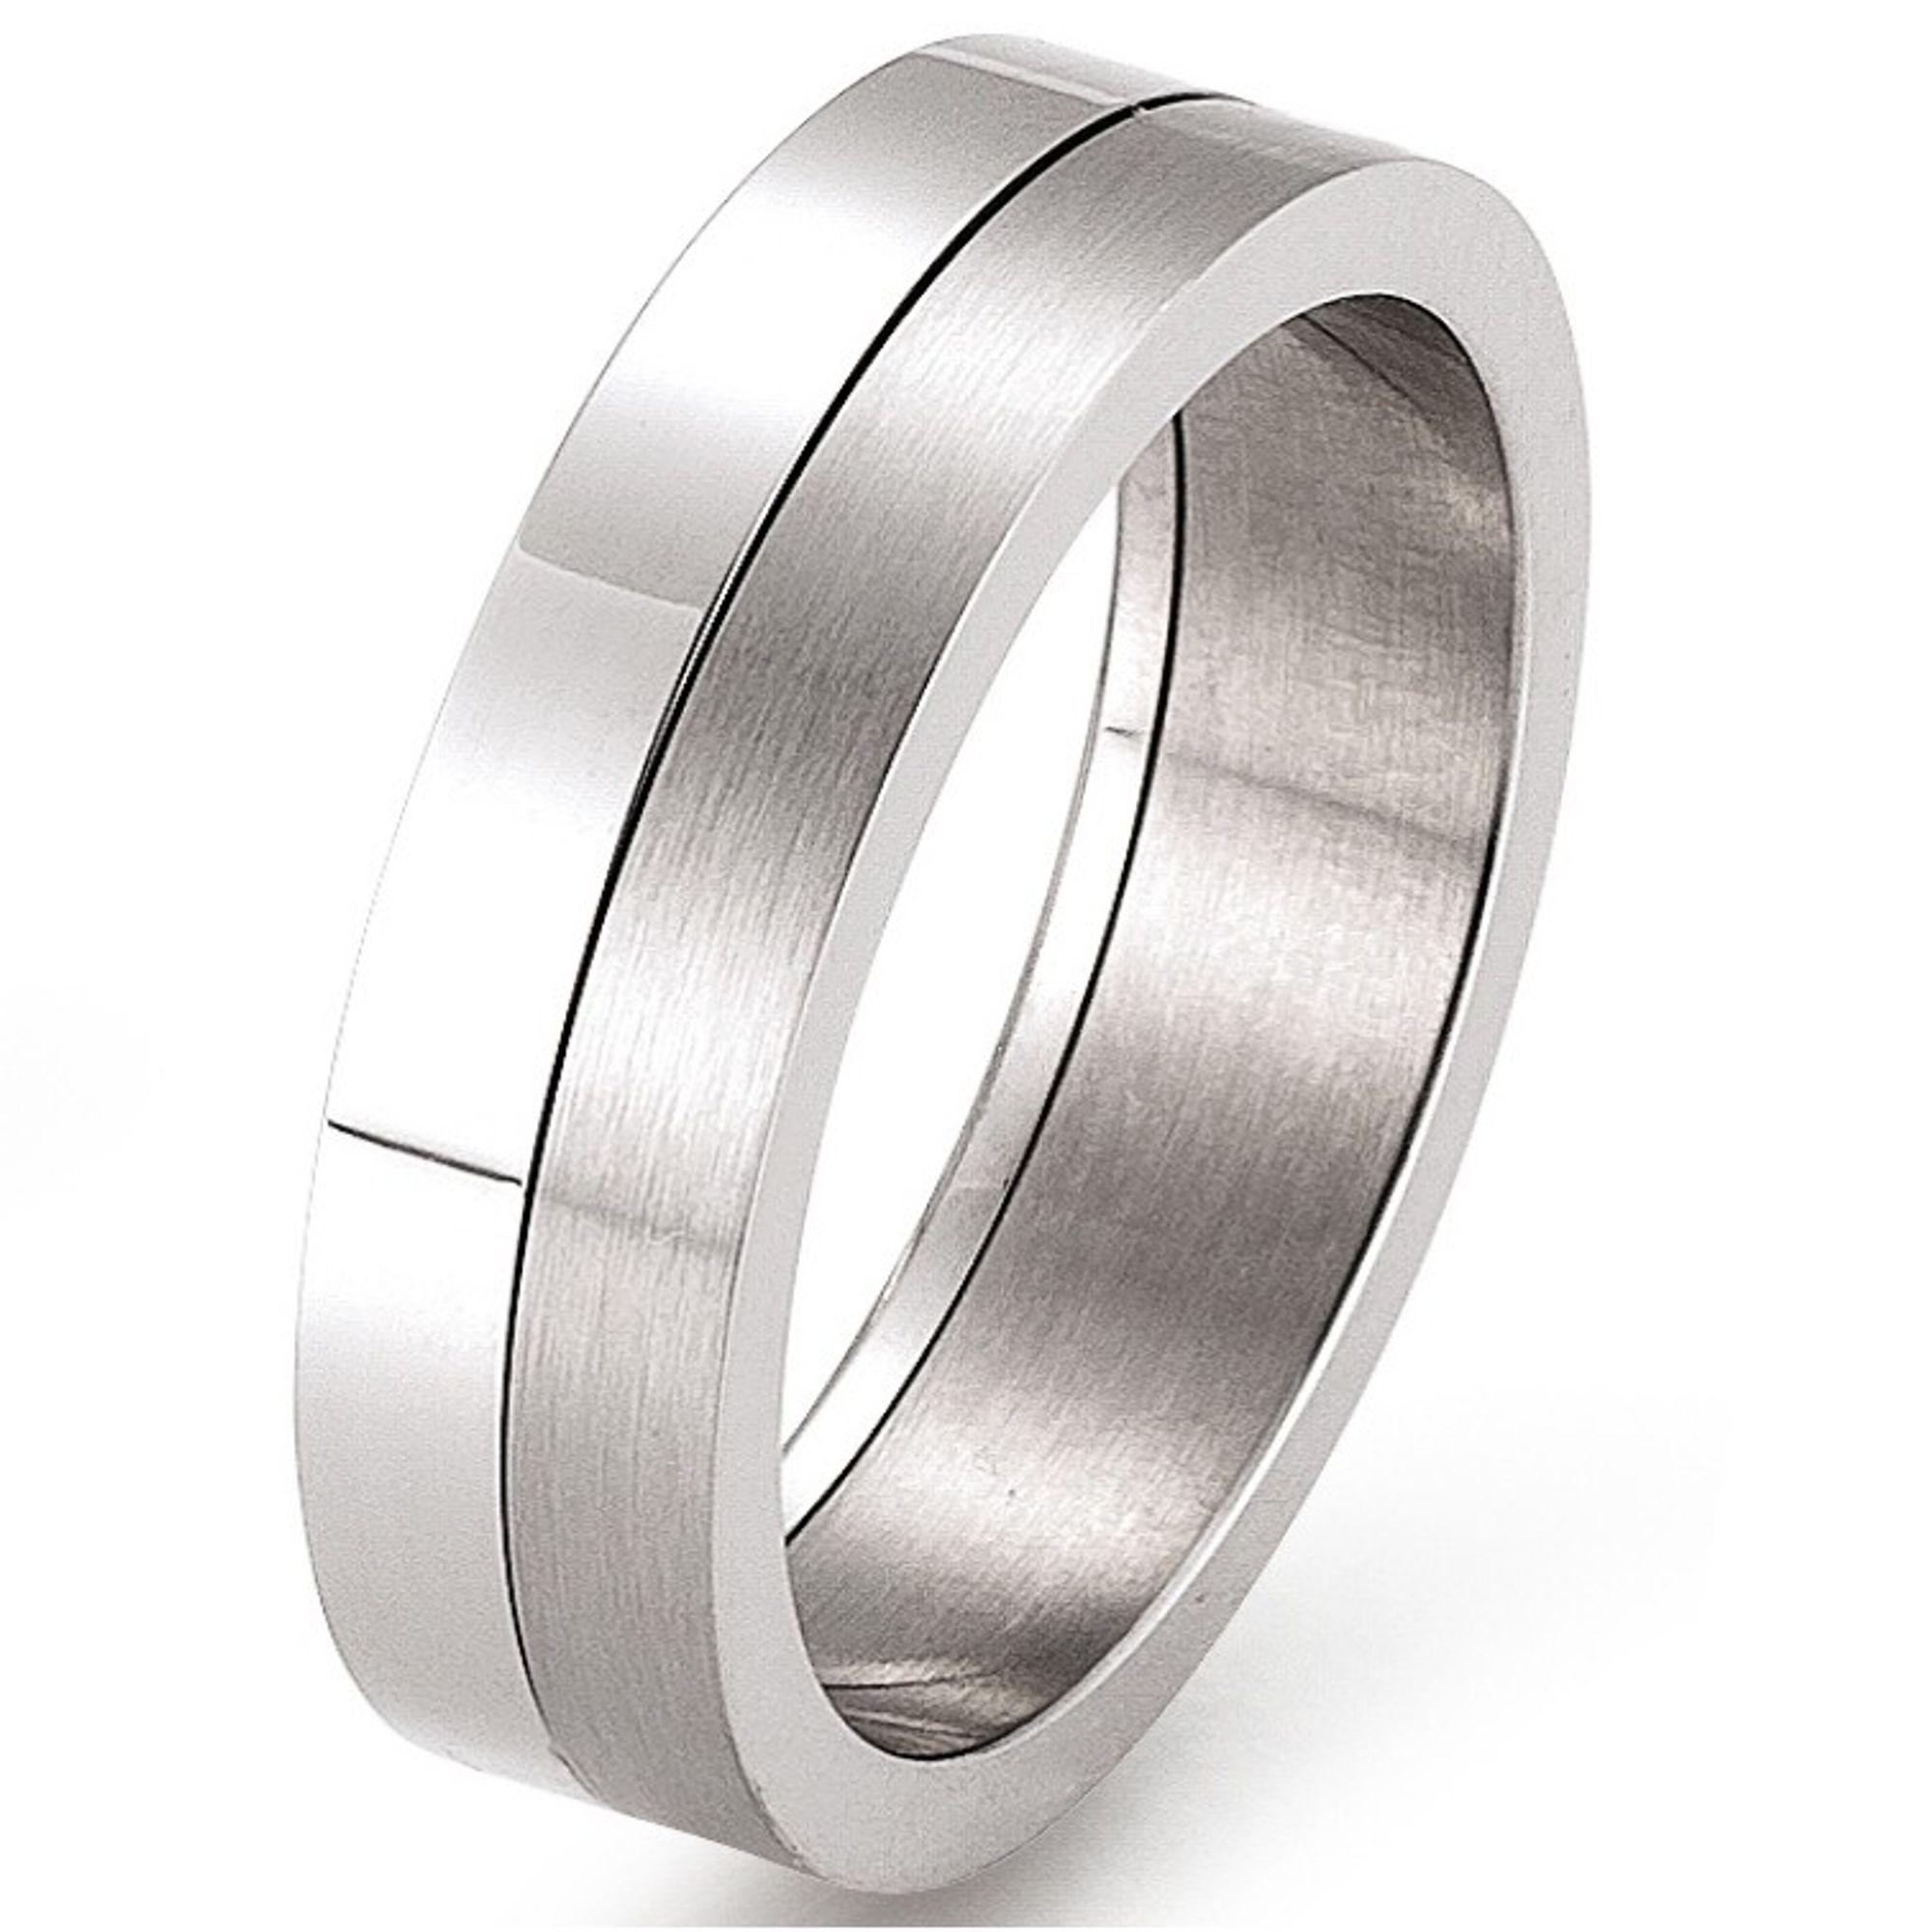 GOOIX Friendship 443-188-000-490 Ring Edelstahl 49 (15.6)